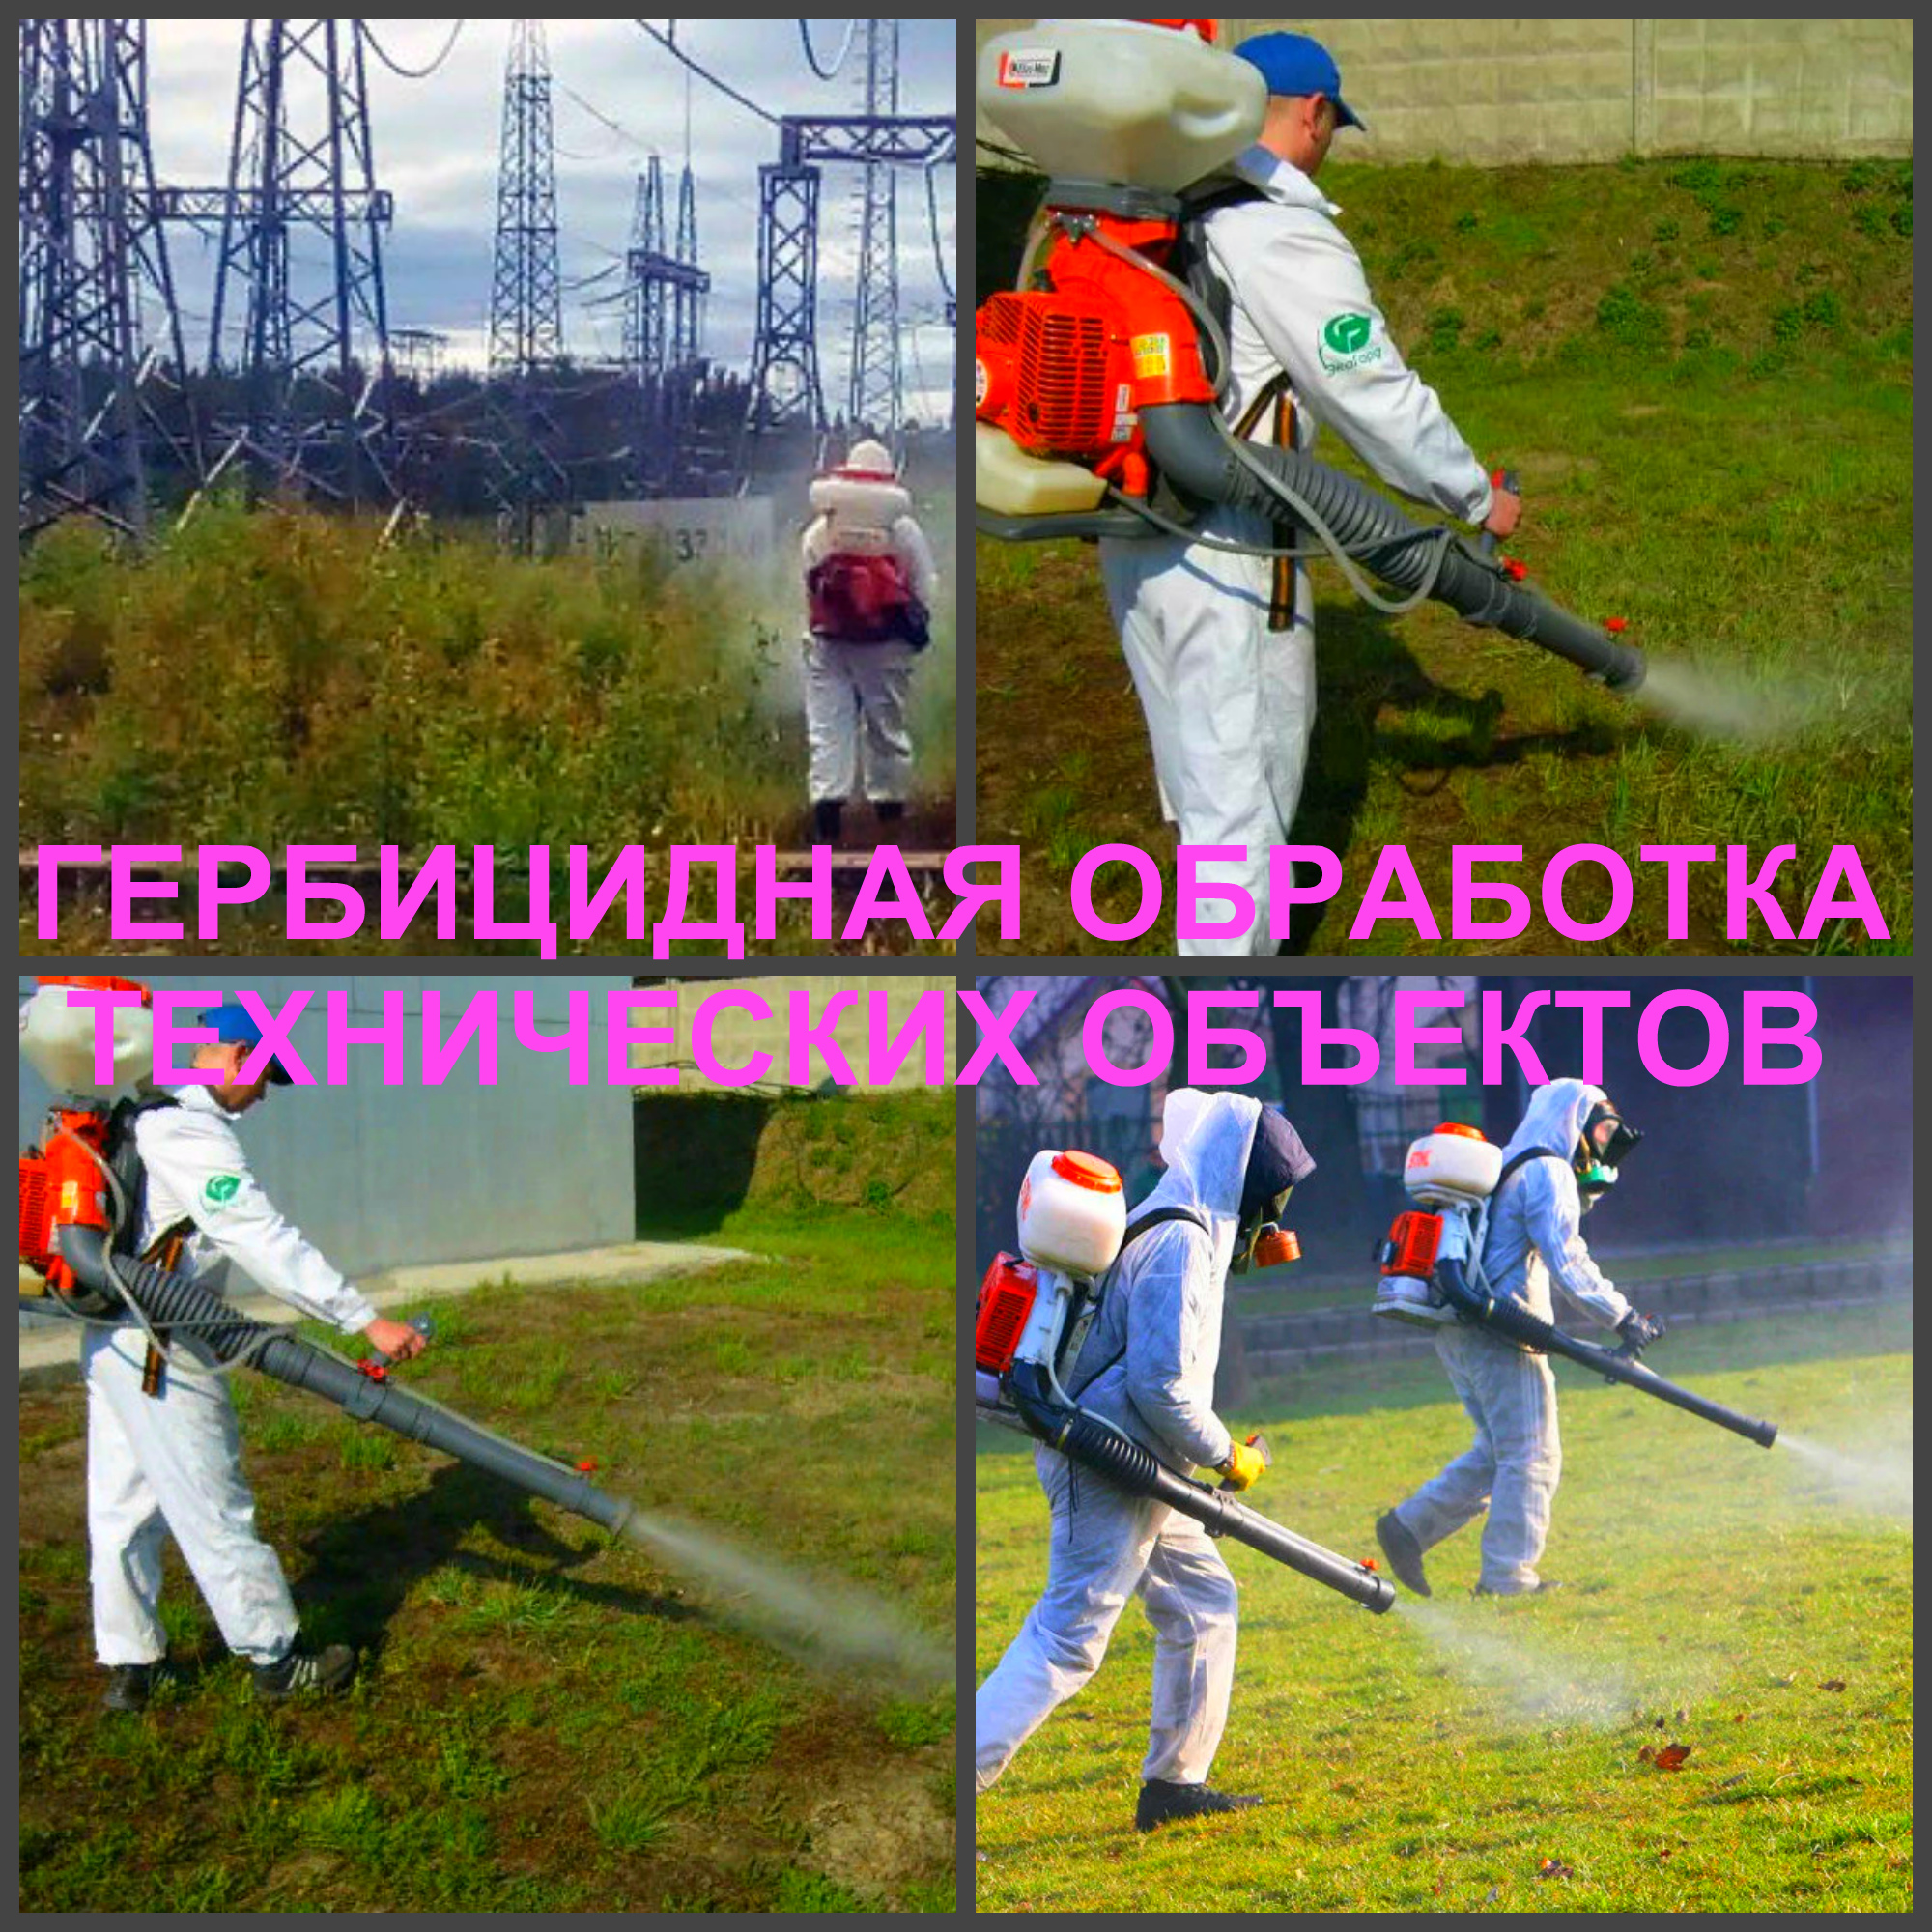 DOSKI-4